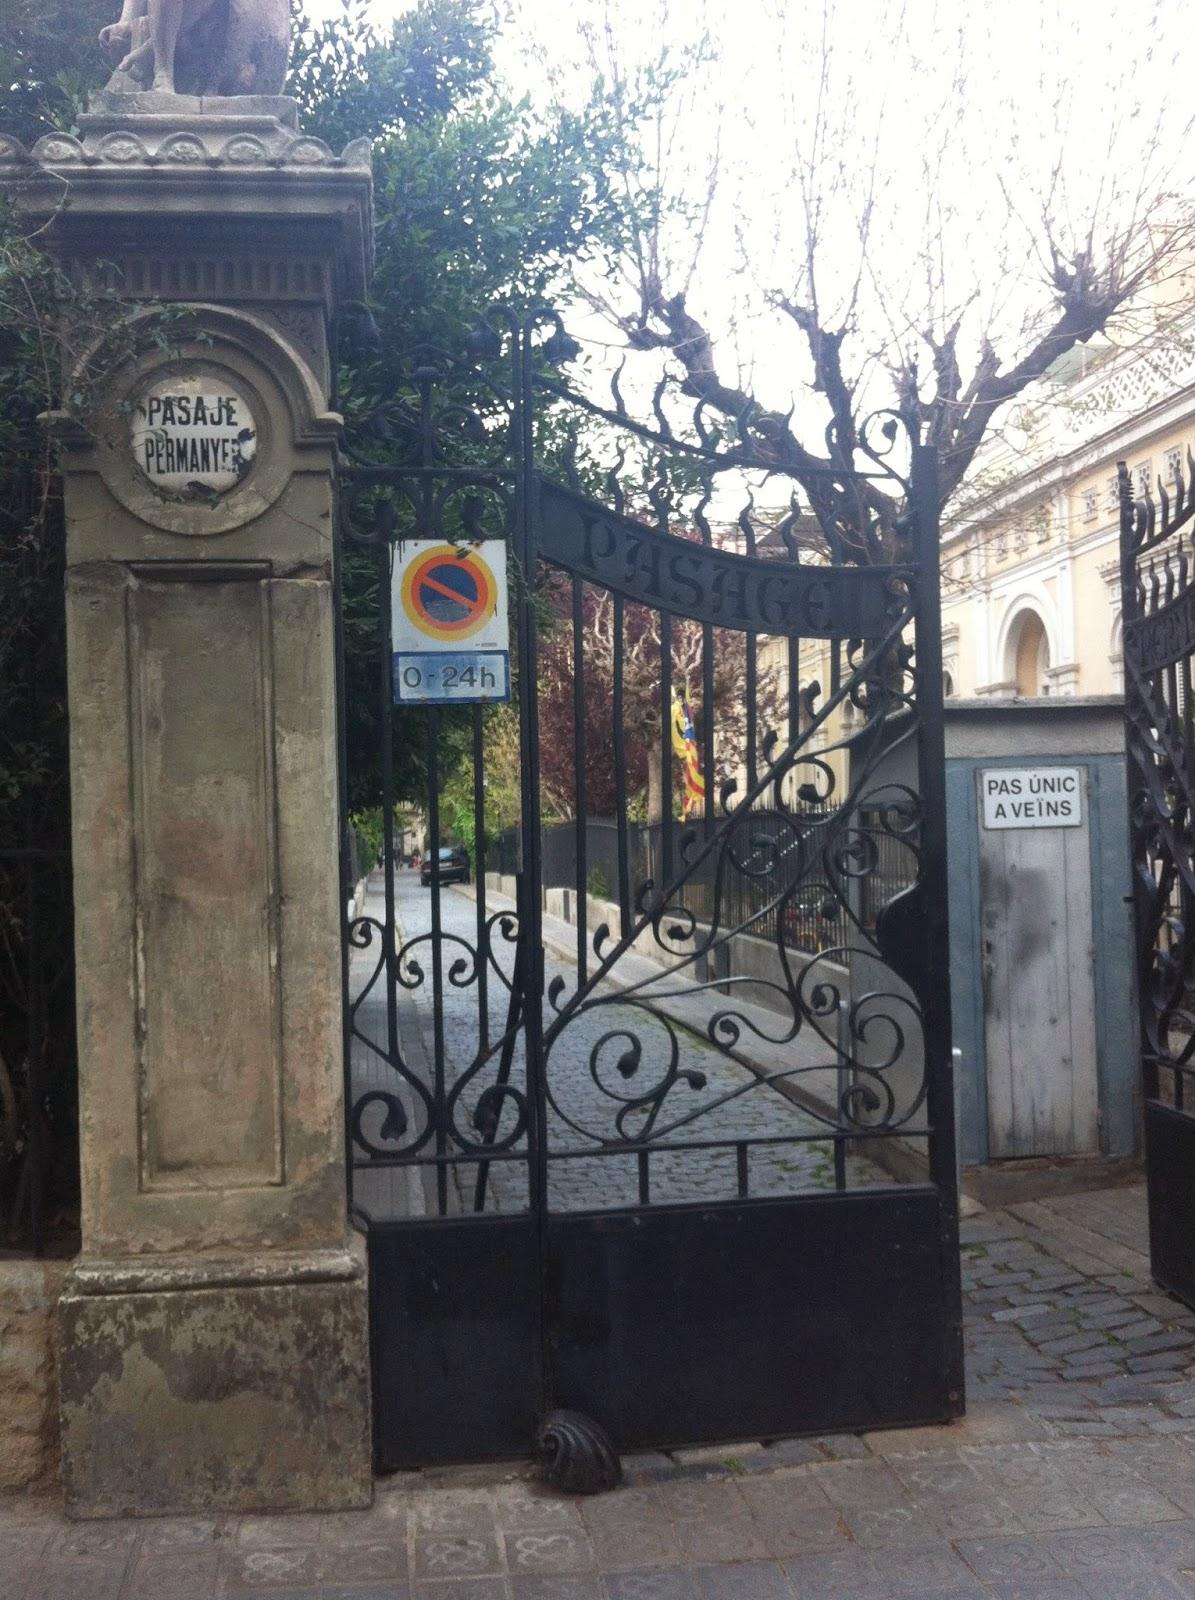 Pasaje Permanyer Barcelona MundoBarcino